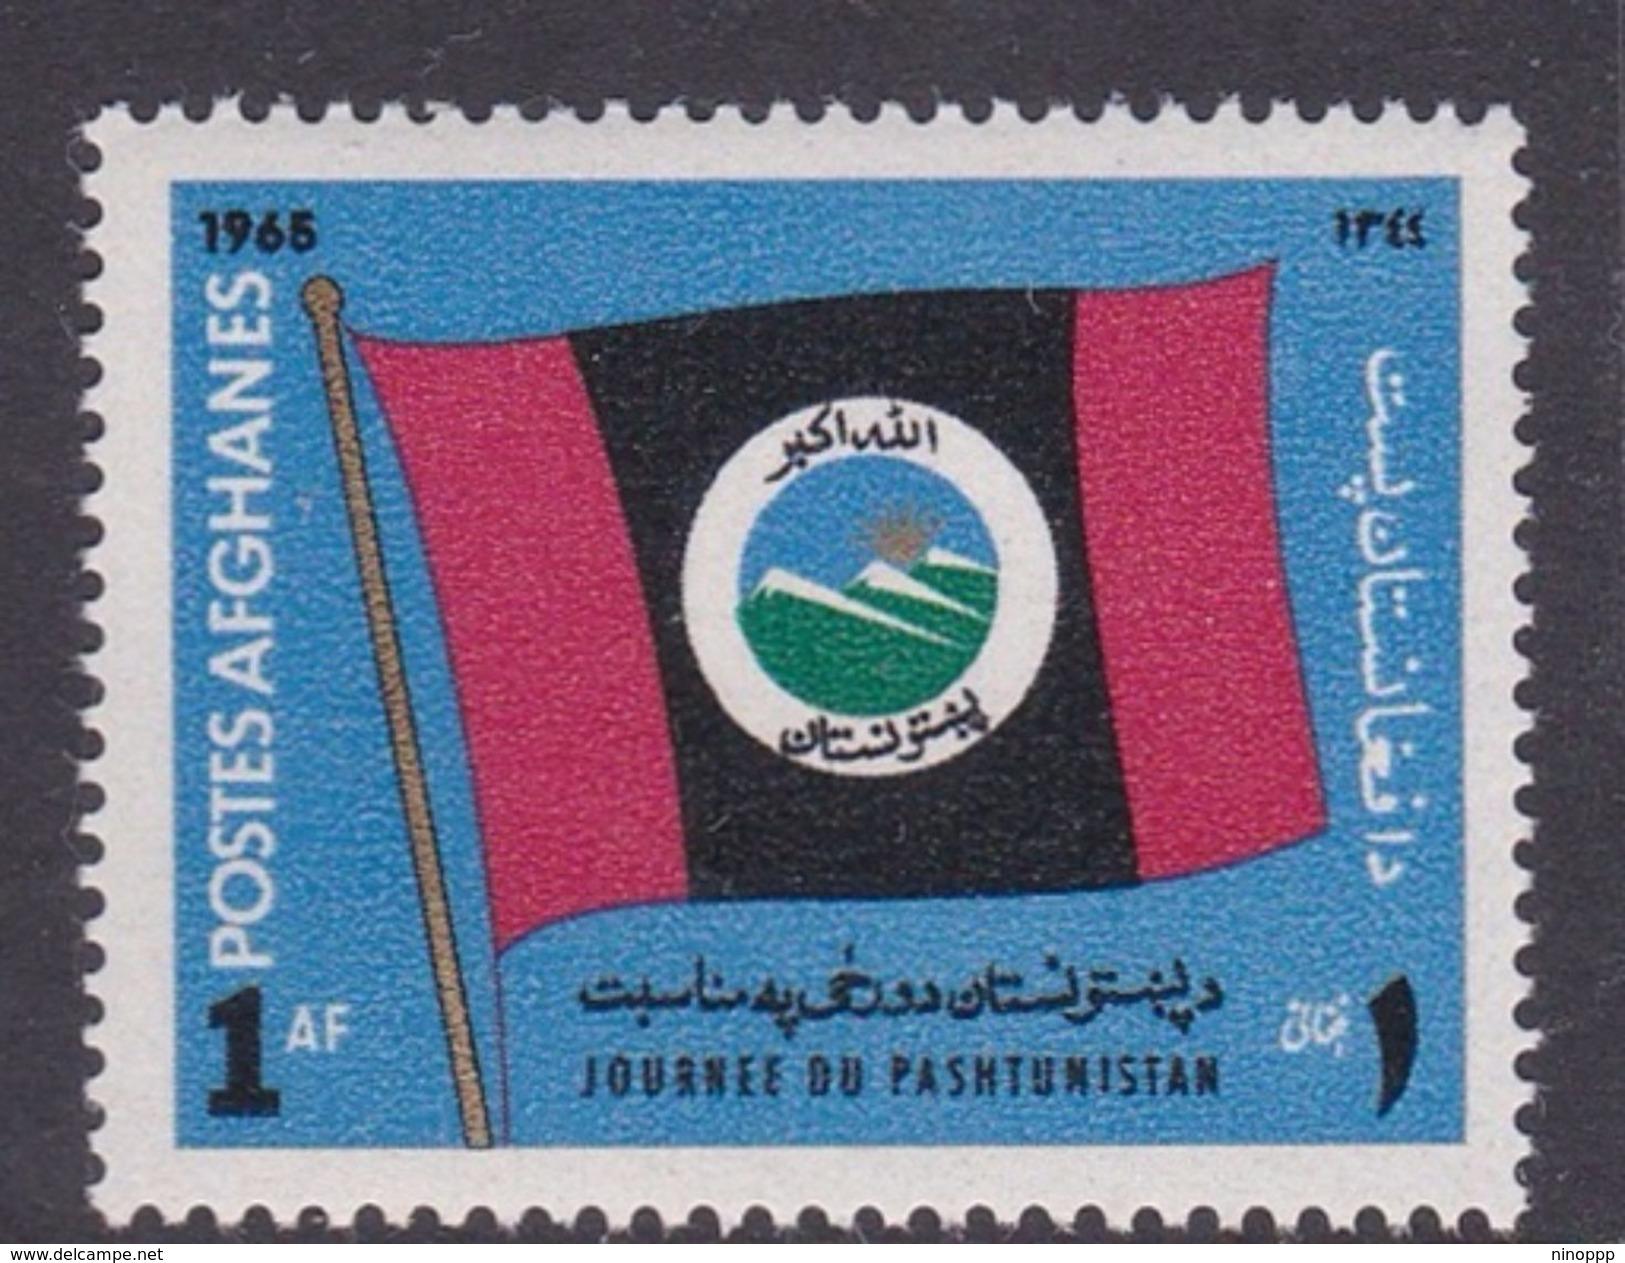 Afghanistan SG 555  1965 Pashtunistan Day MNH - Afghanistan